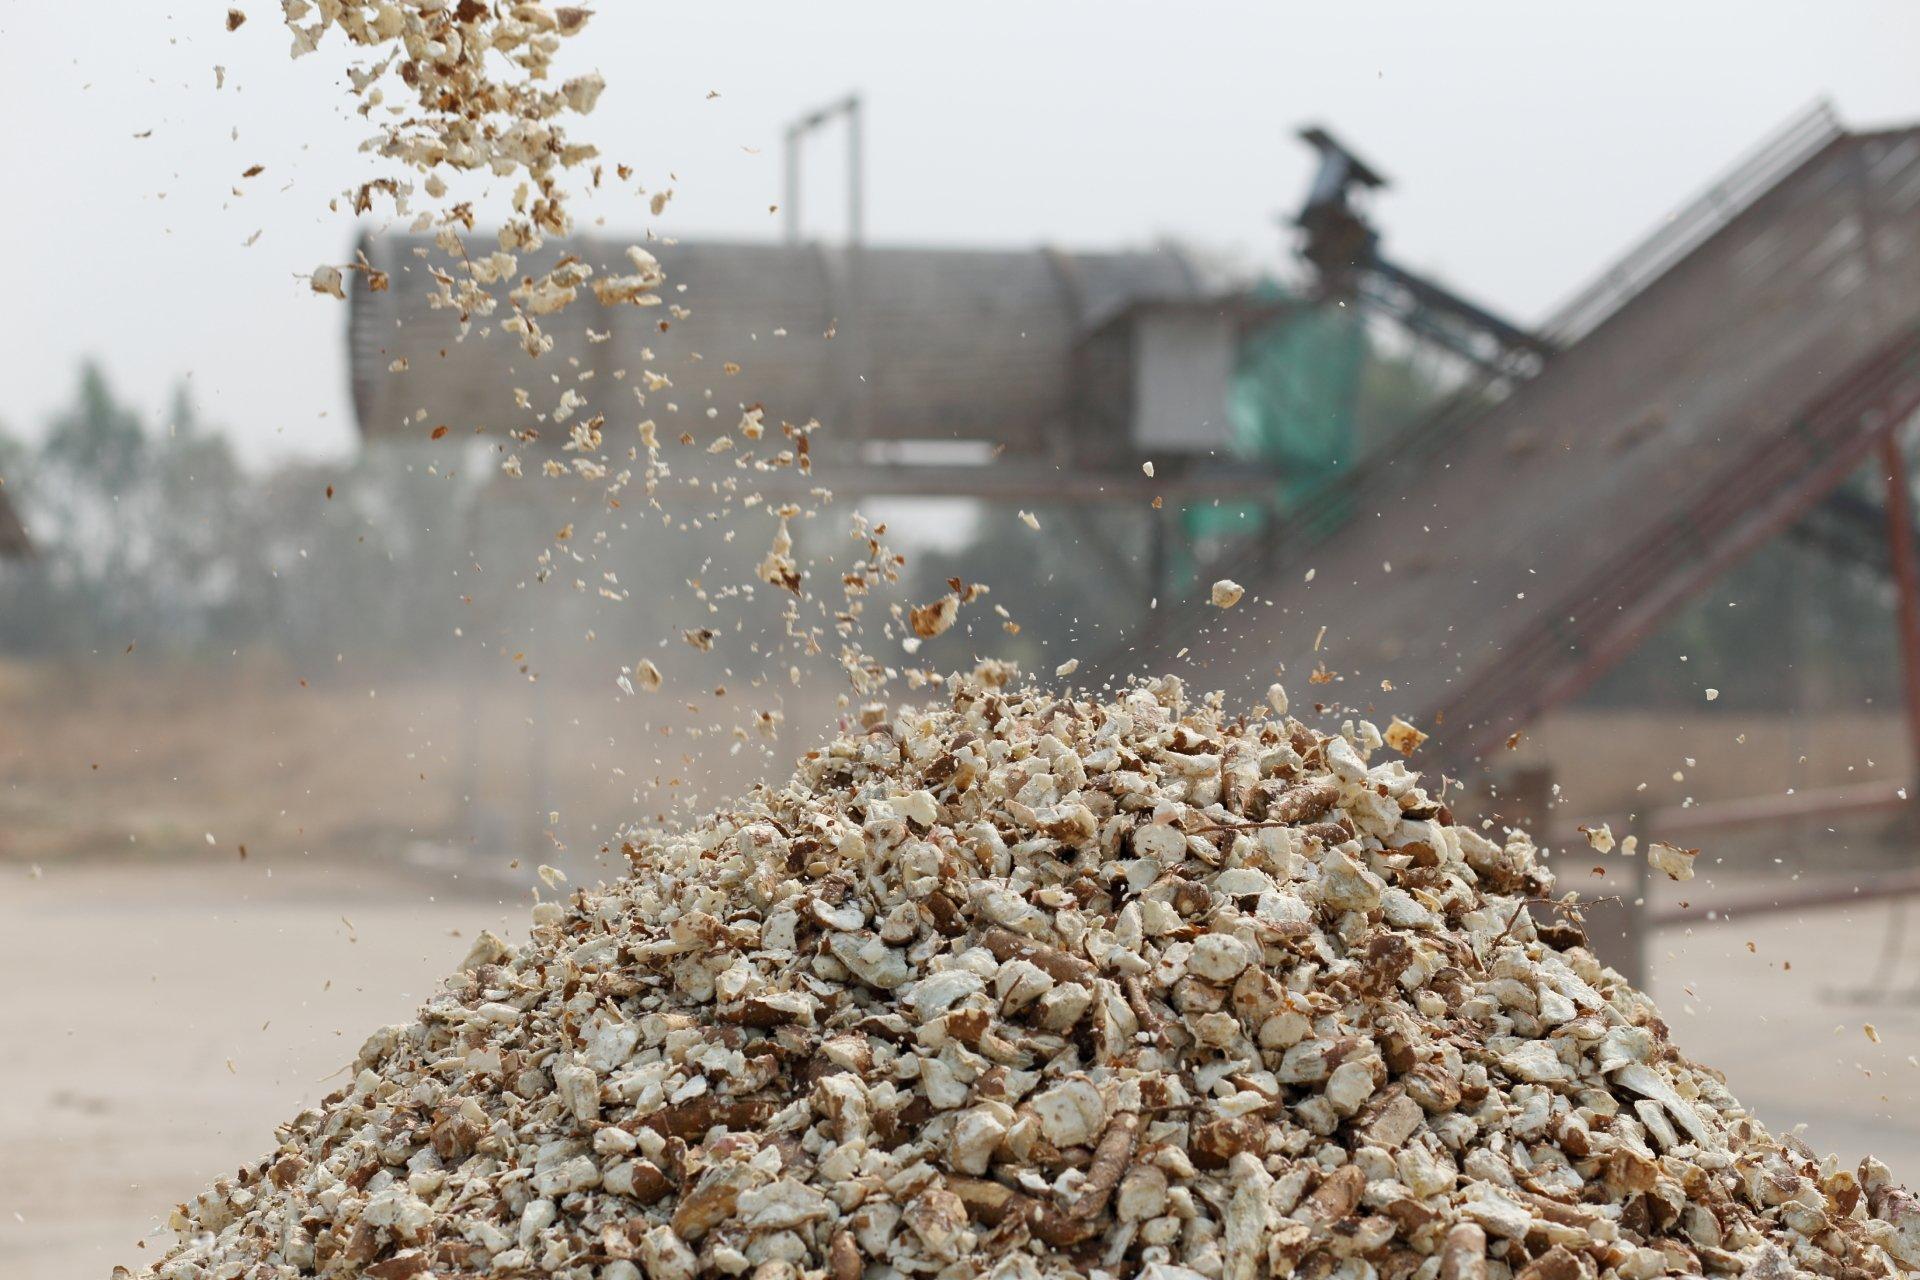 navajo agricultural products industry napi farmington nm - HD1920×1280